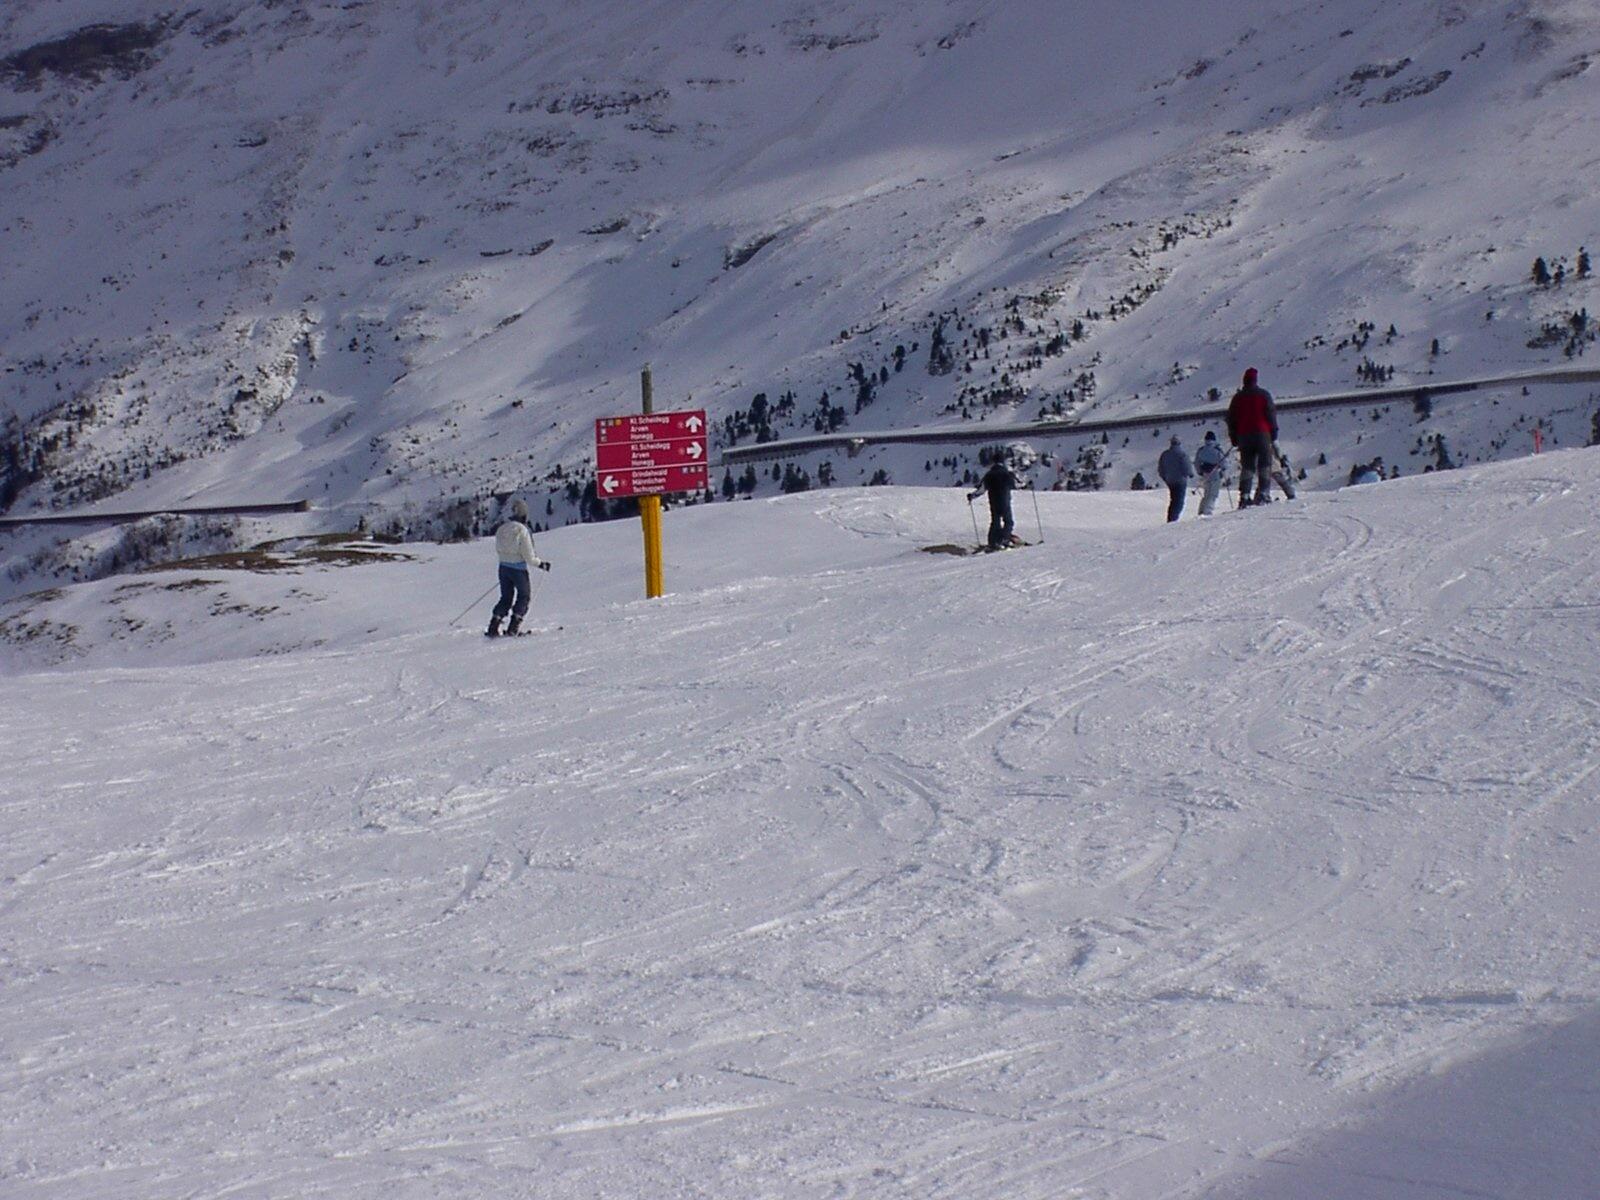 Jungfraujoch, Grindelwald